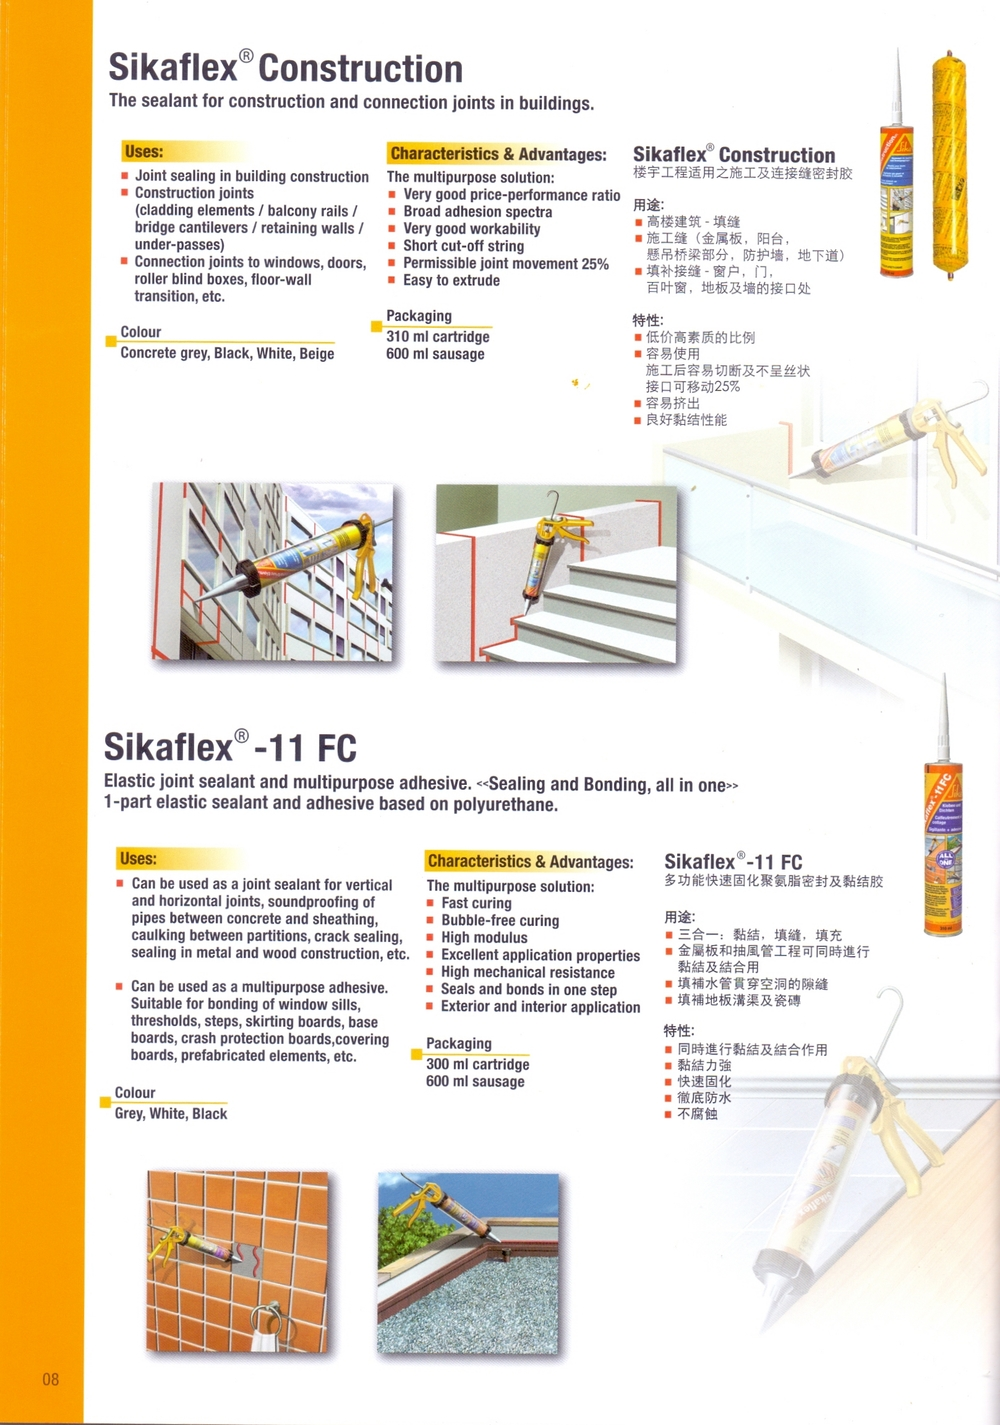 Sikaflex Construction  Sikaflex - 11 FC